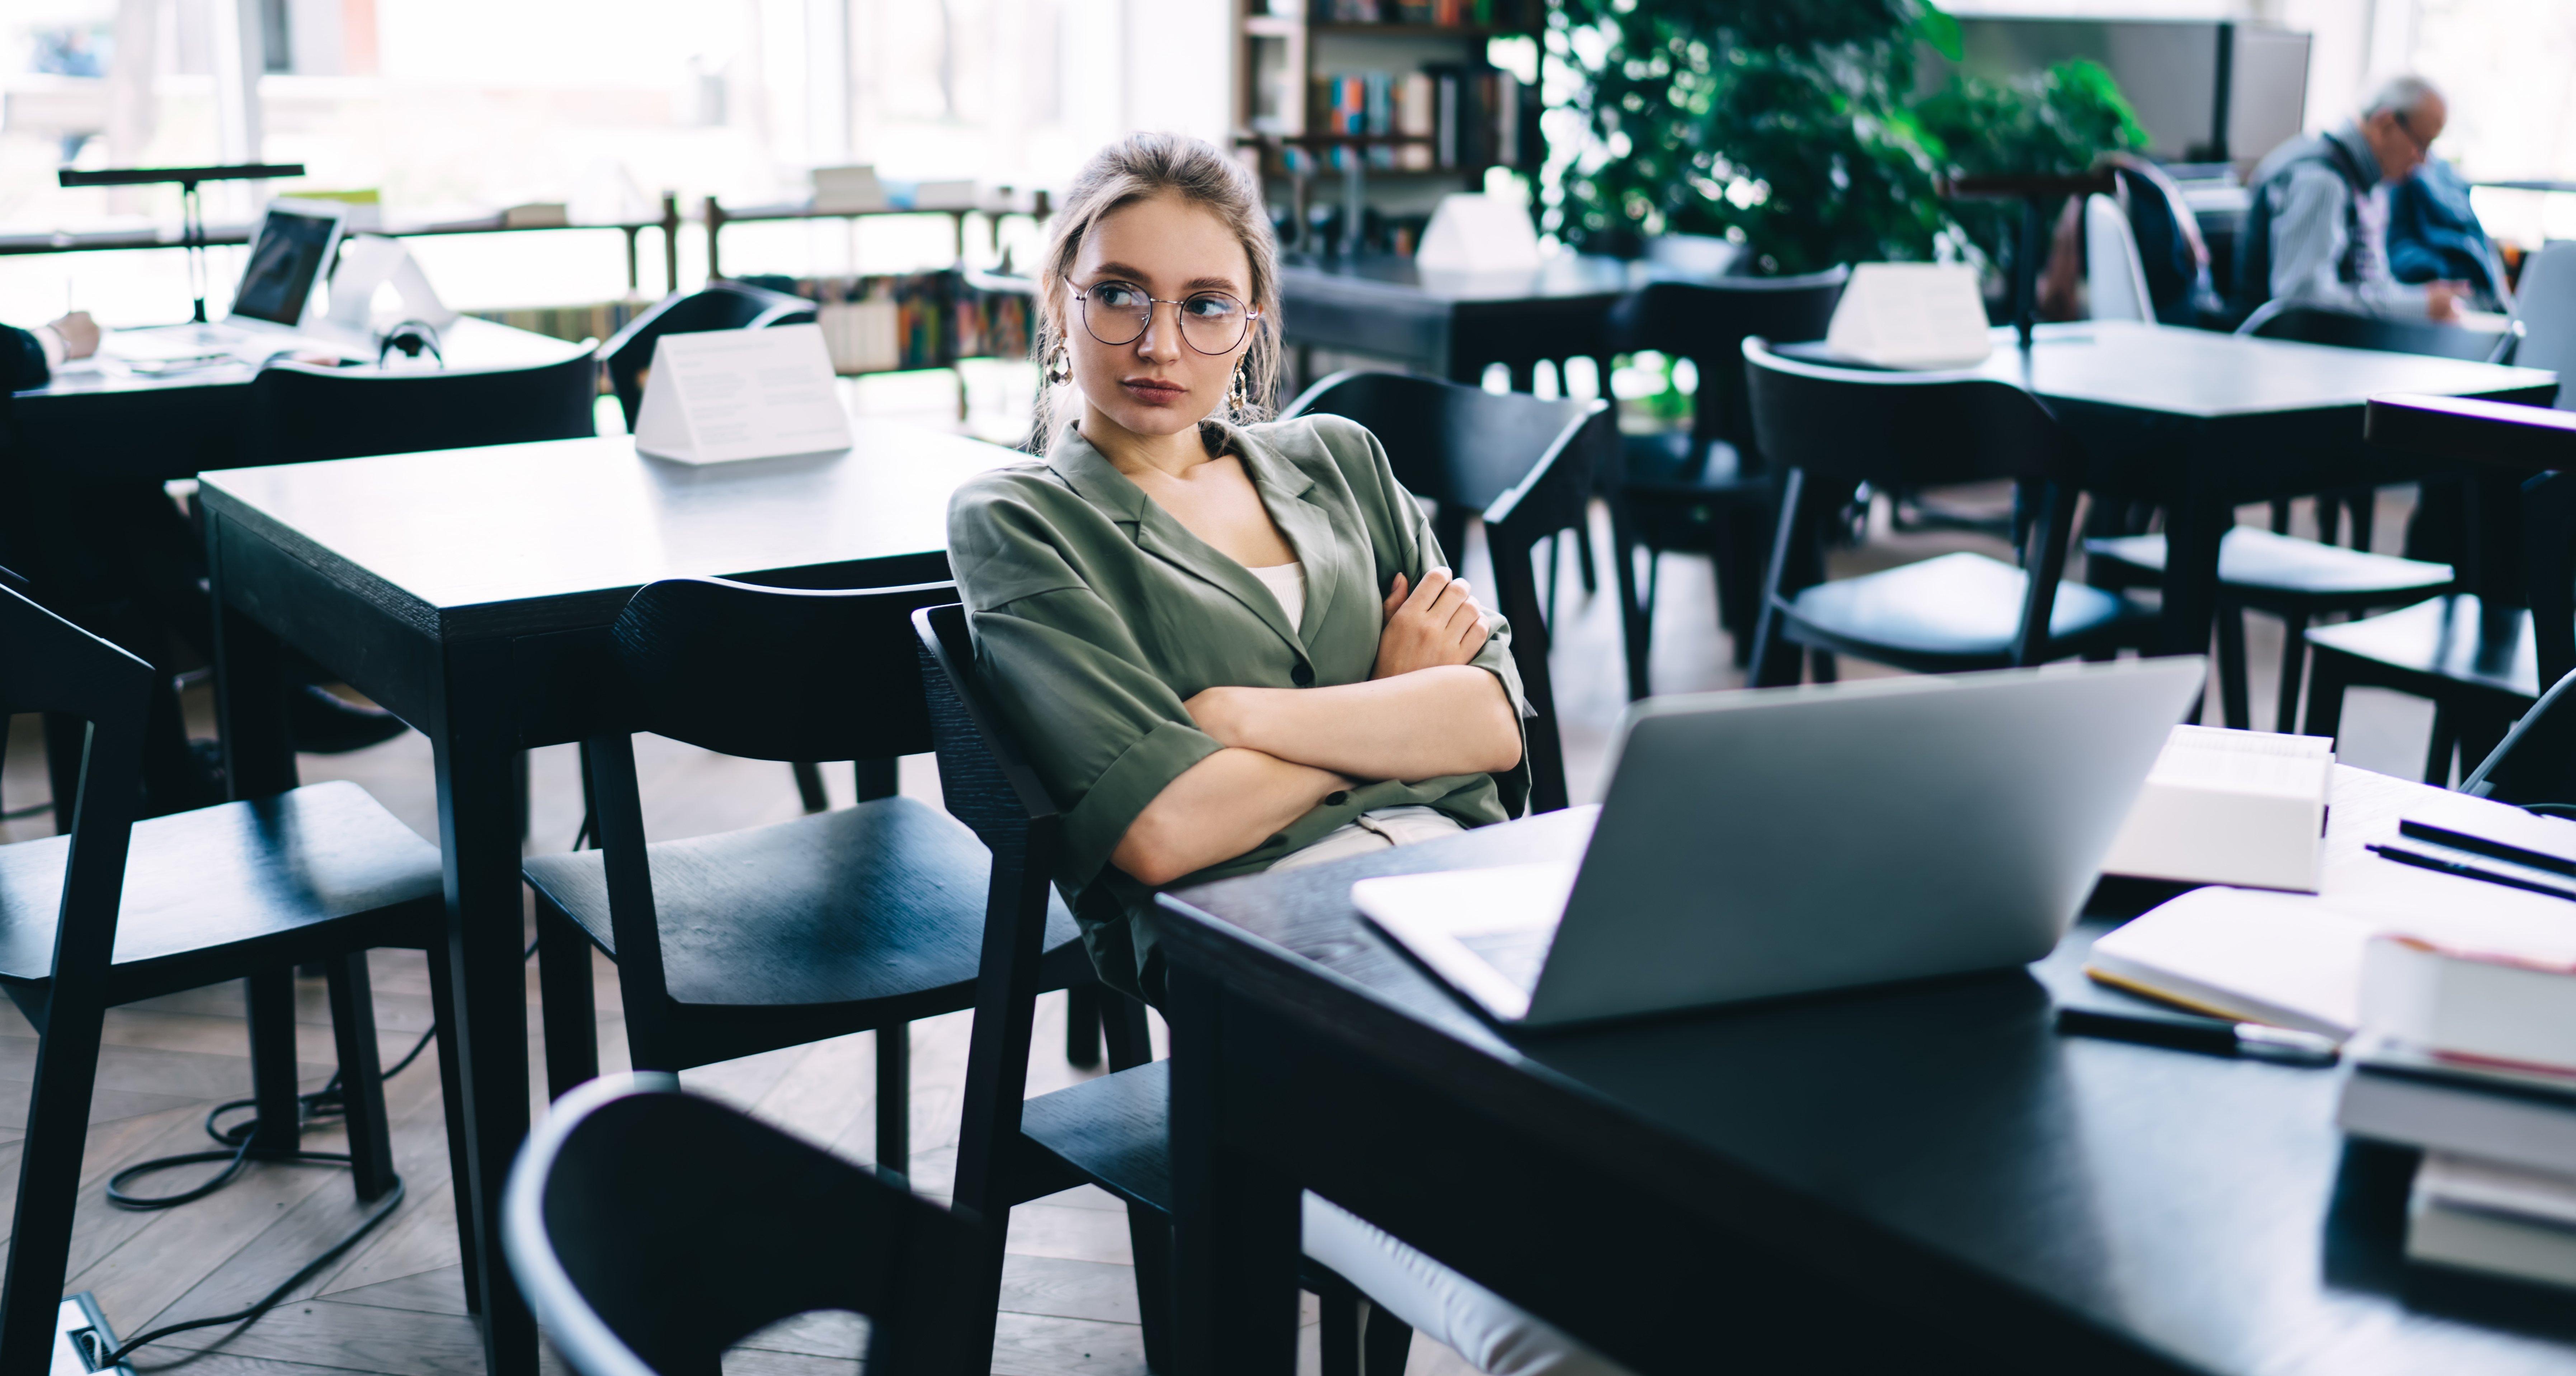 bored reader sitting in restaurant